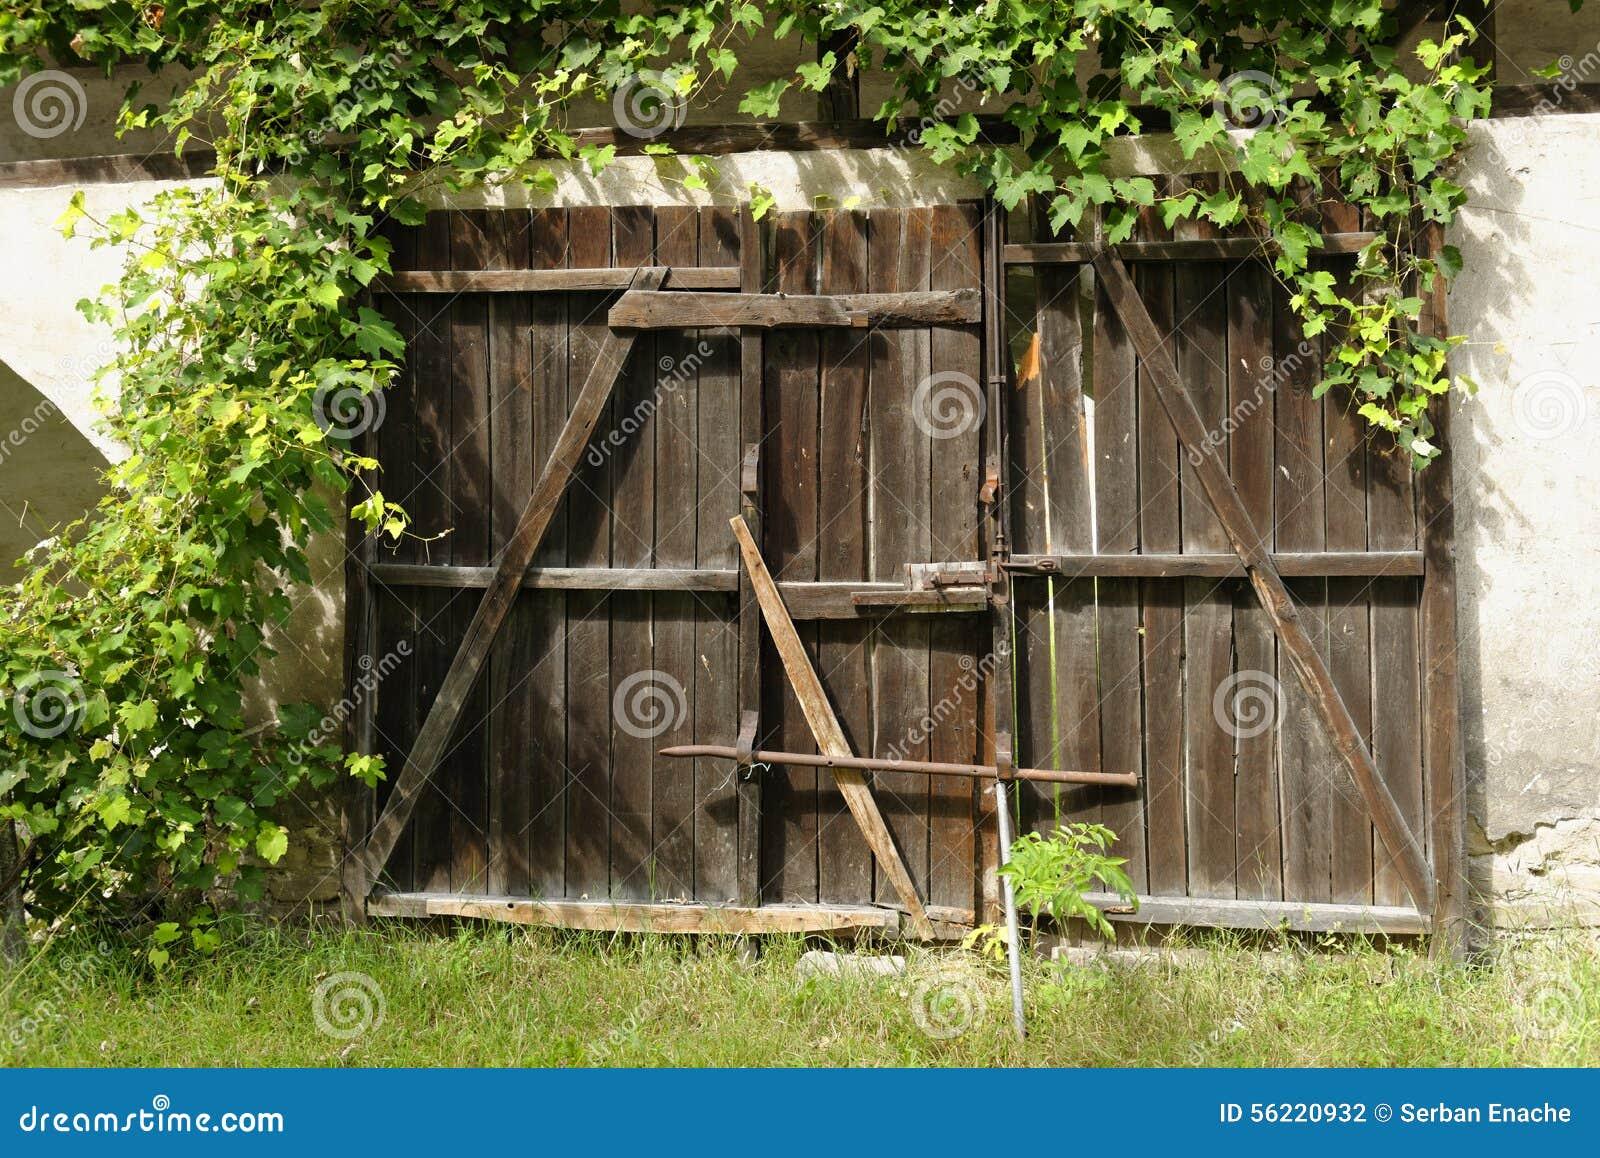 Wooden garden gates for sale - Old Wooden Garden Gate Stock Photography